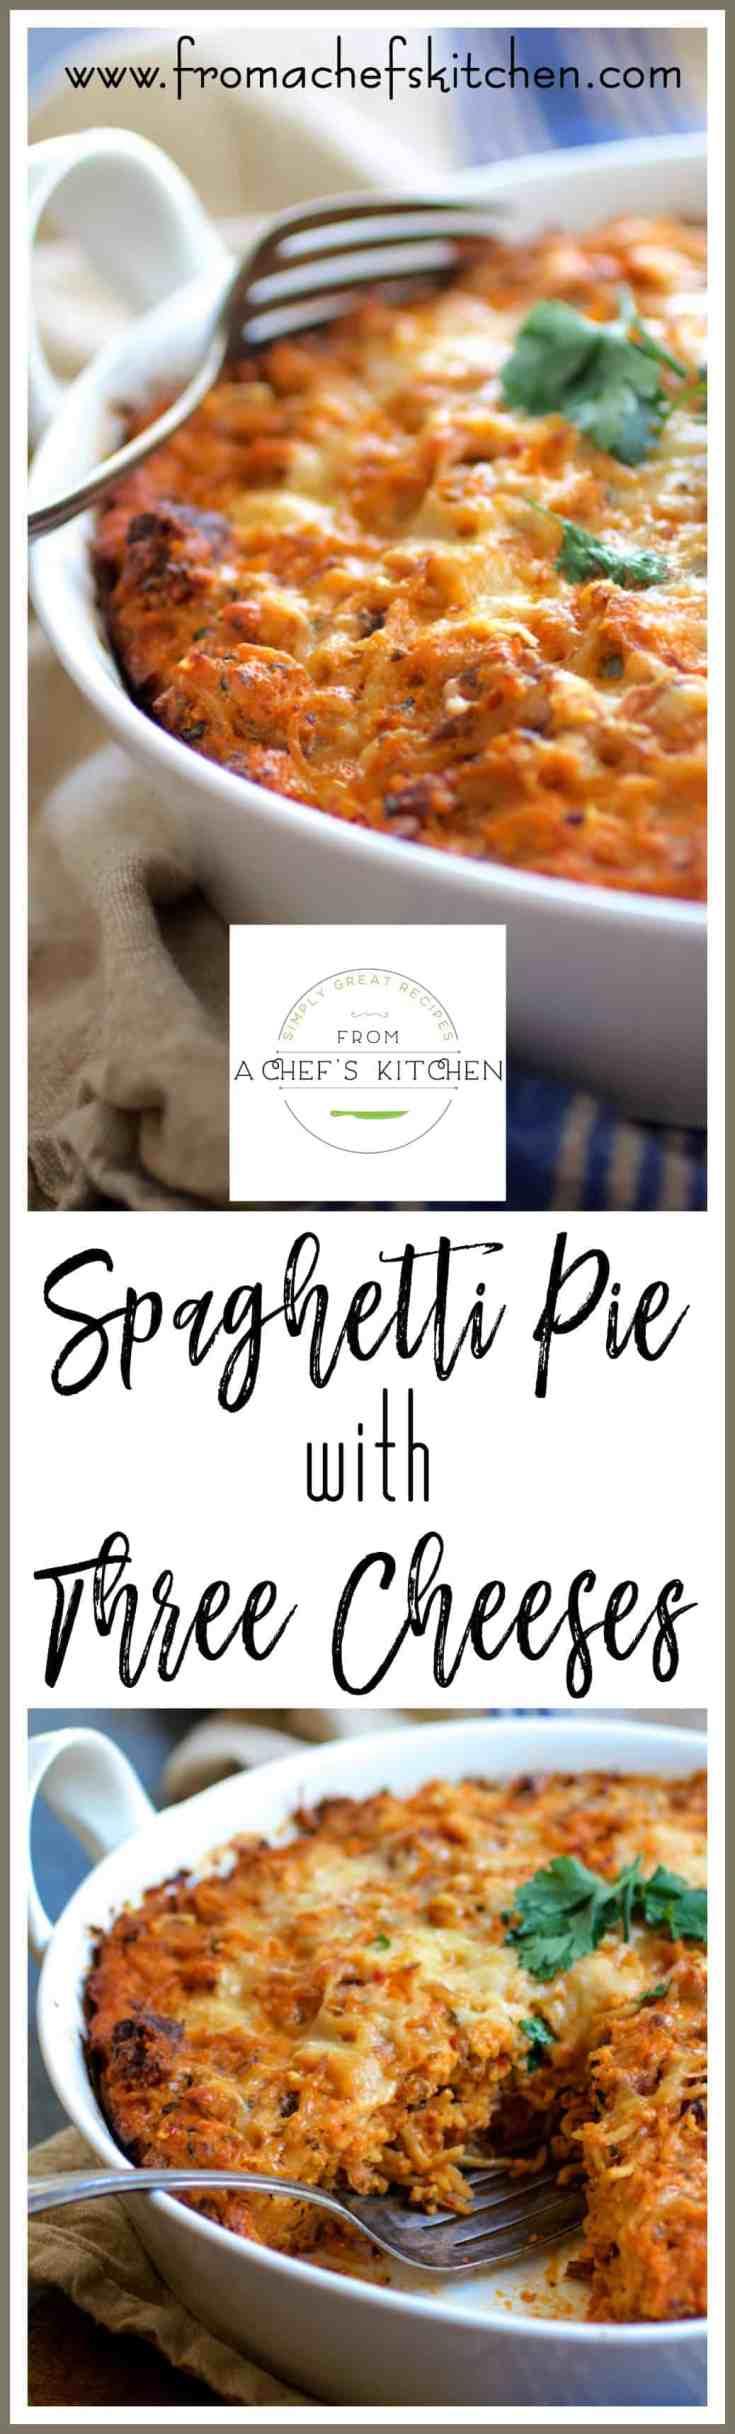 Spaghetti Pie with Three Cheeses--smoked mozzarella, ricotta and Parmesan--is how to turn leftover spaghetti into something amazing! #wastenot #spaghetti #pasta #cheese #leftovers